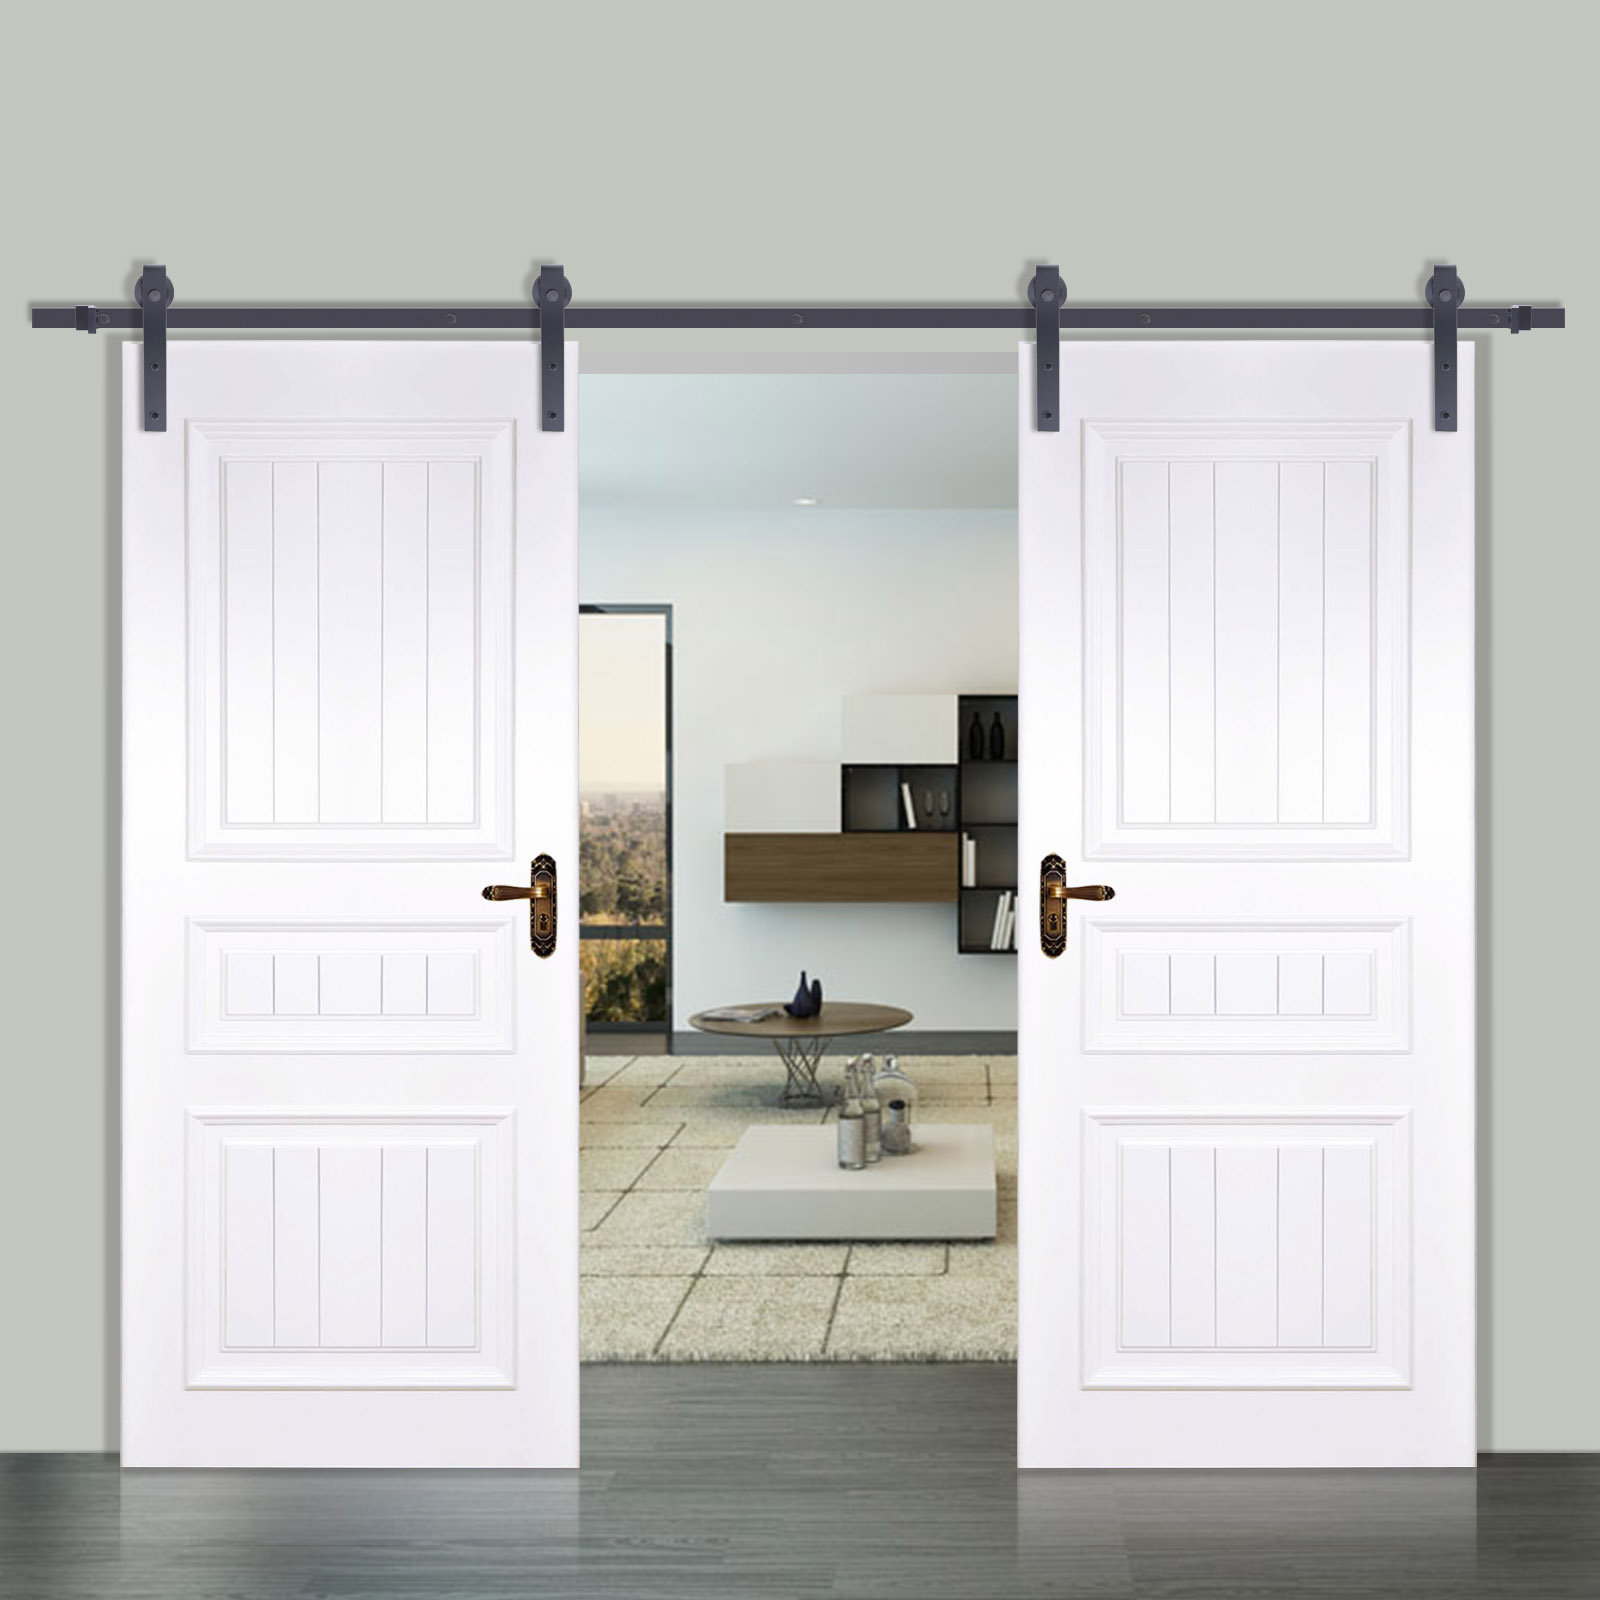 12ft top hung double sliding barn door hardware track wood door kit promotion ebay for Double hung interior closet doors